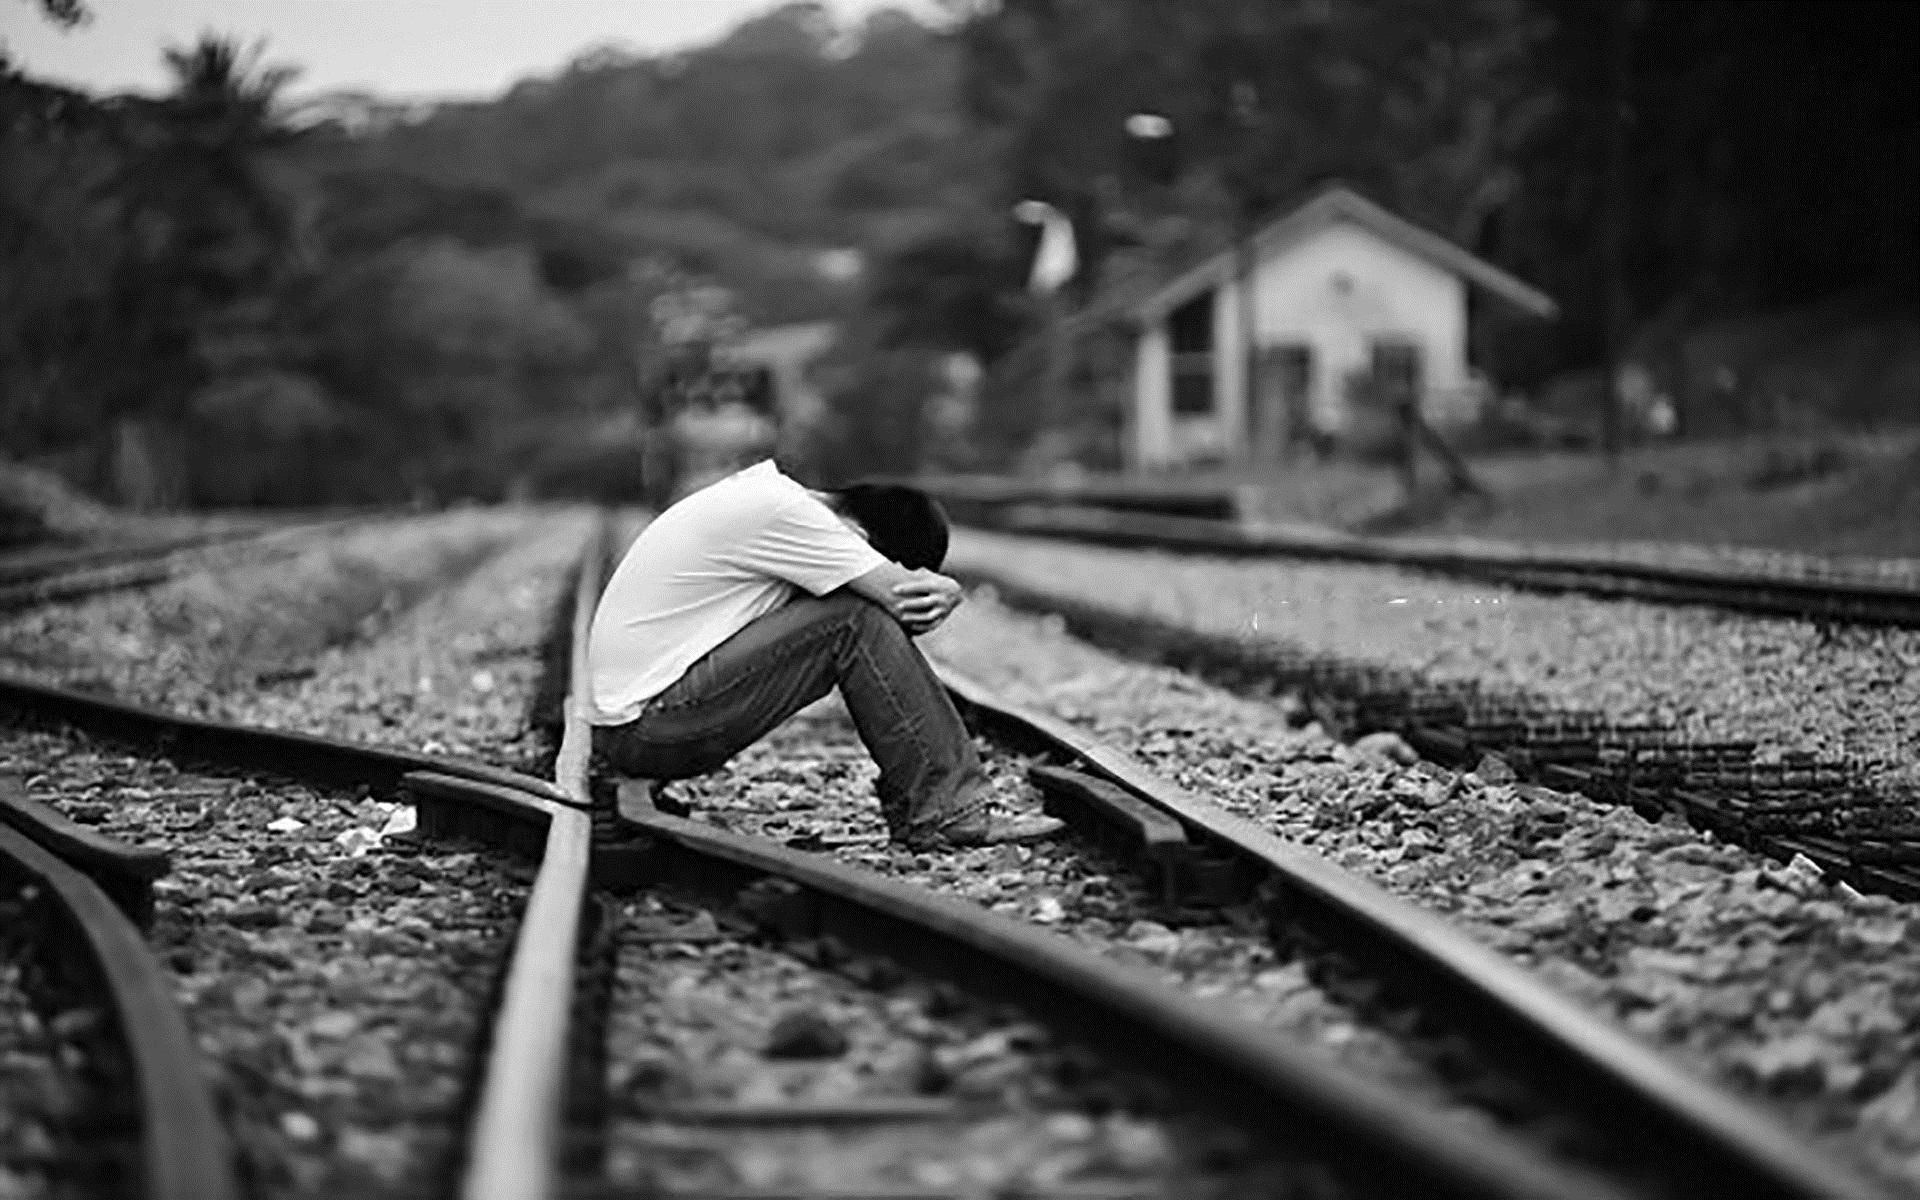 Hình nền con trai buồn